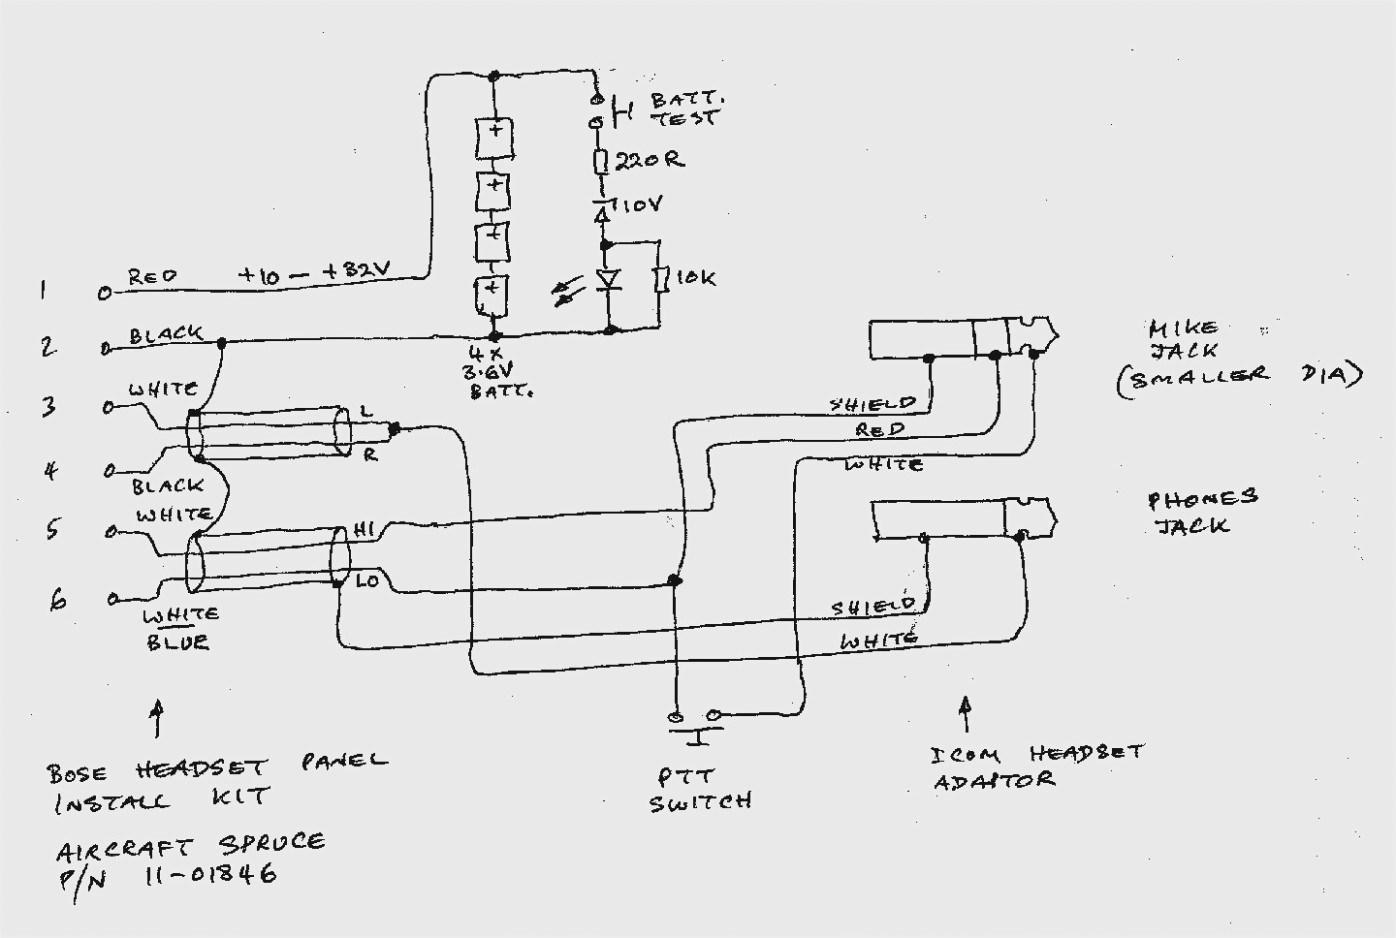 Astounding Stereo Headset Mic Wiring Diagram Online Wiring Diagram Wiring Cloud Intelaidewilluminateatxorg